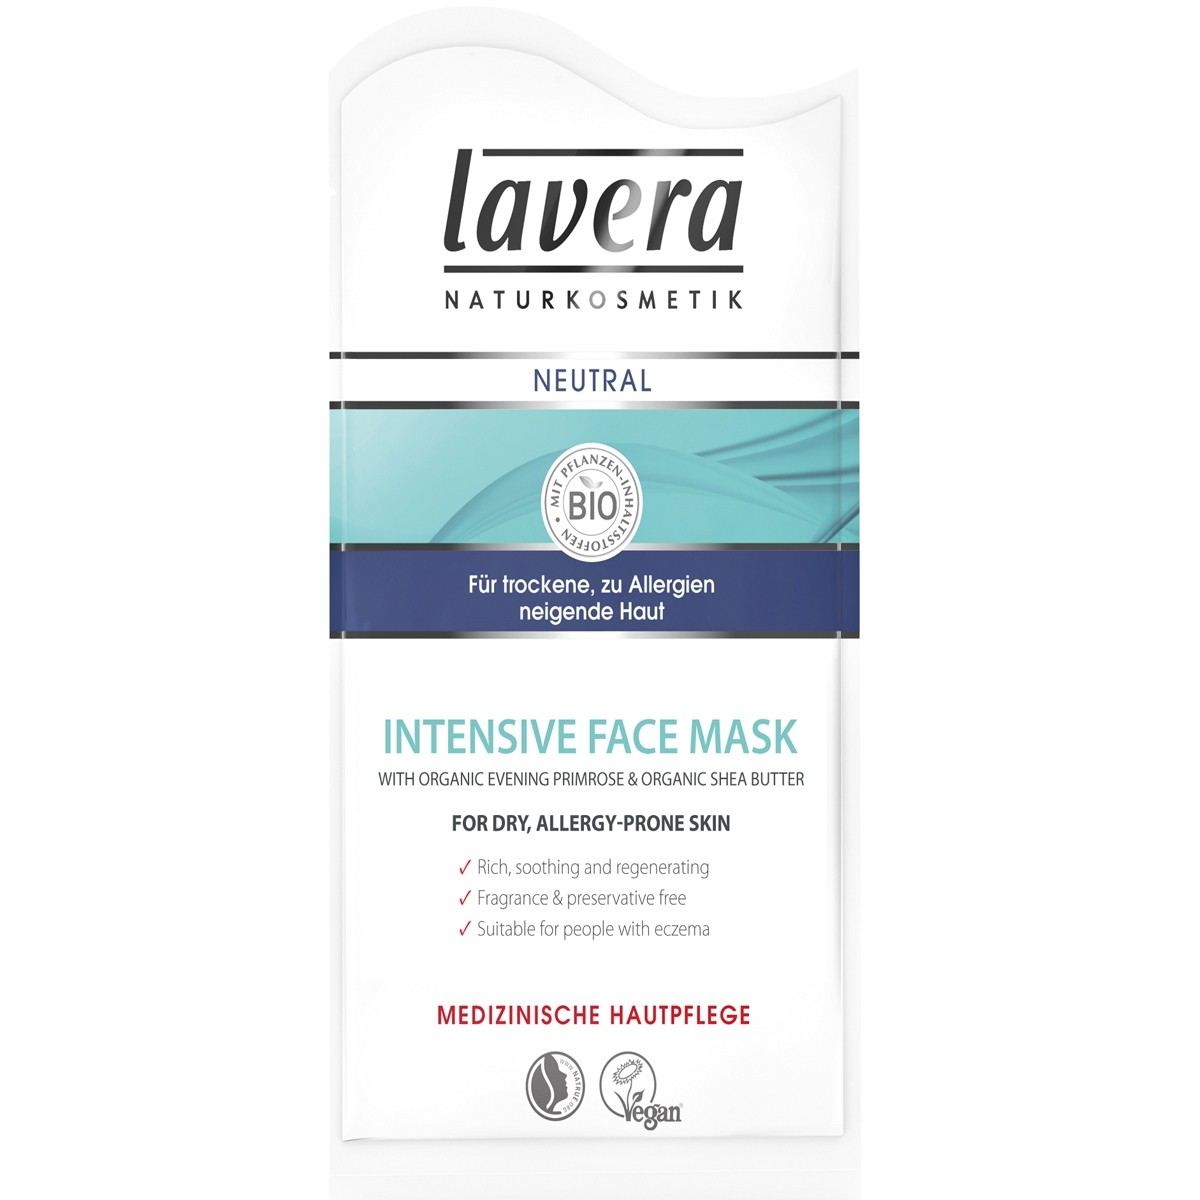 Lavera Neutral Intensive Mask